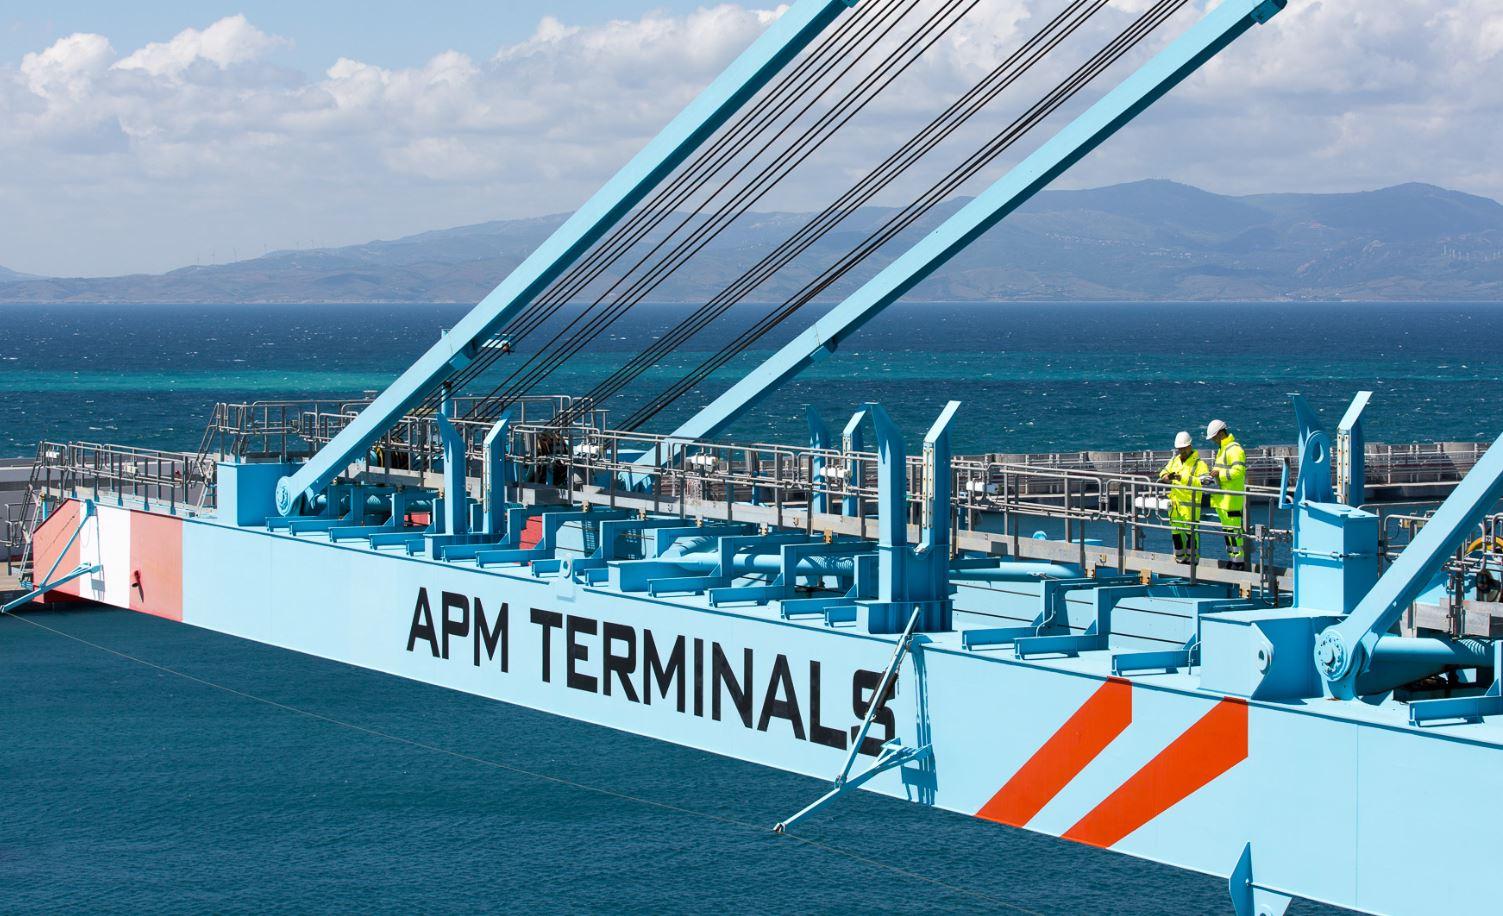 APM Terminals' profit down 38pc to US$161 million as sales fall 8.6pc